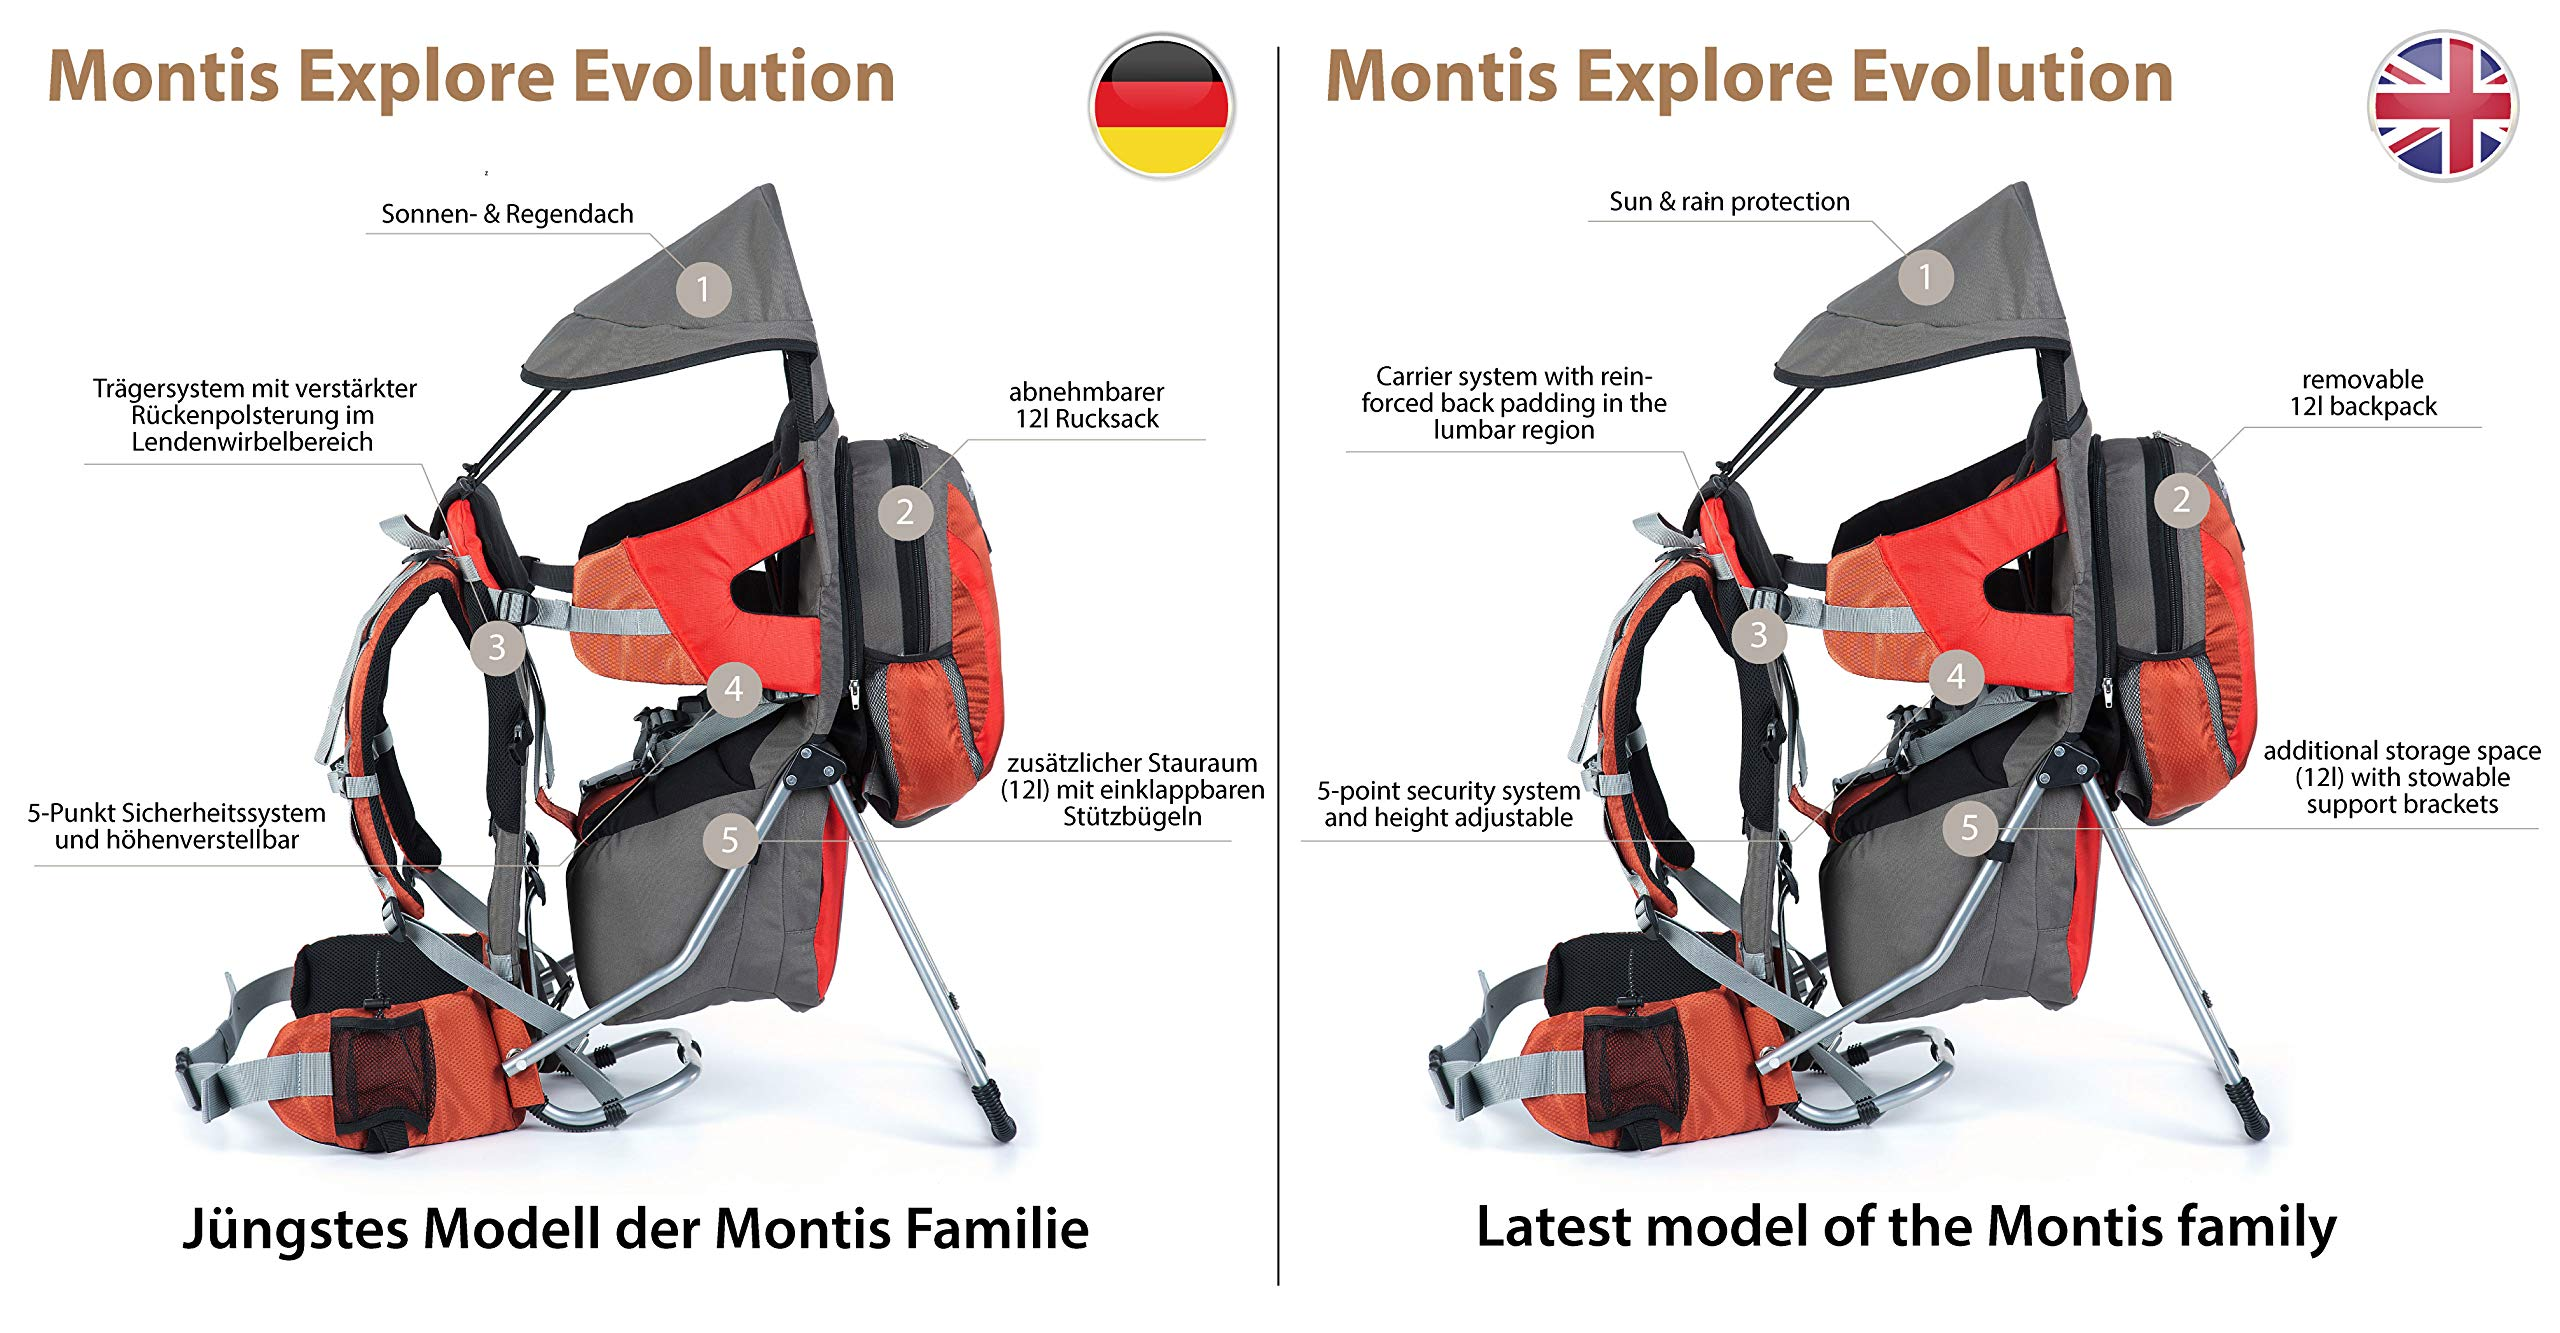 81ONUlUXpNL - Montis Explore Evolution - Mochila portabebés (Carga máxima de 25 kg), Color Naranja y Rojo (2000 gr)